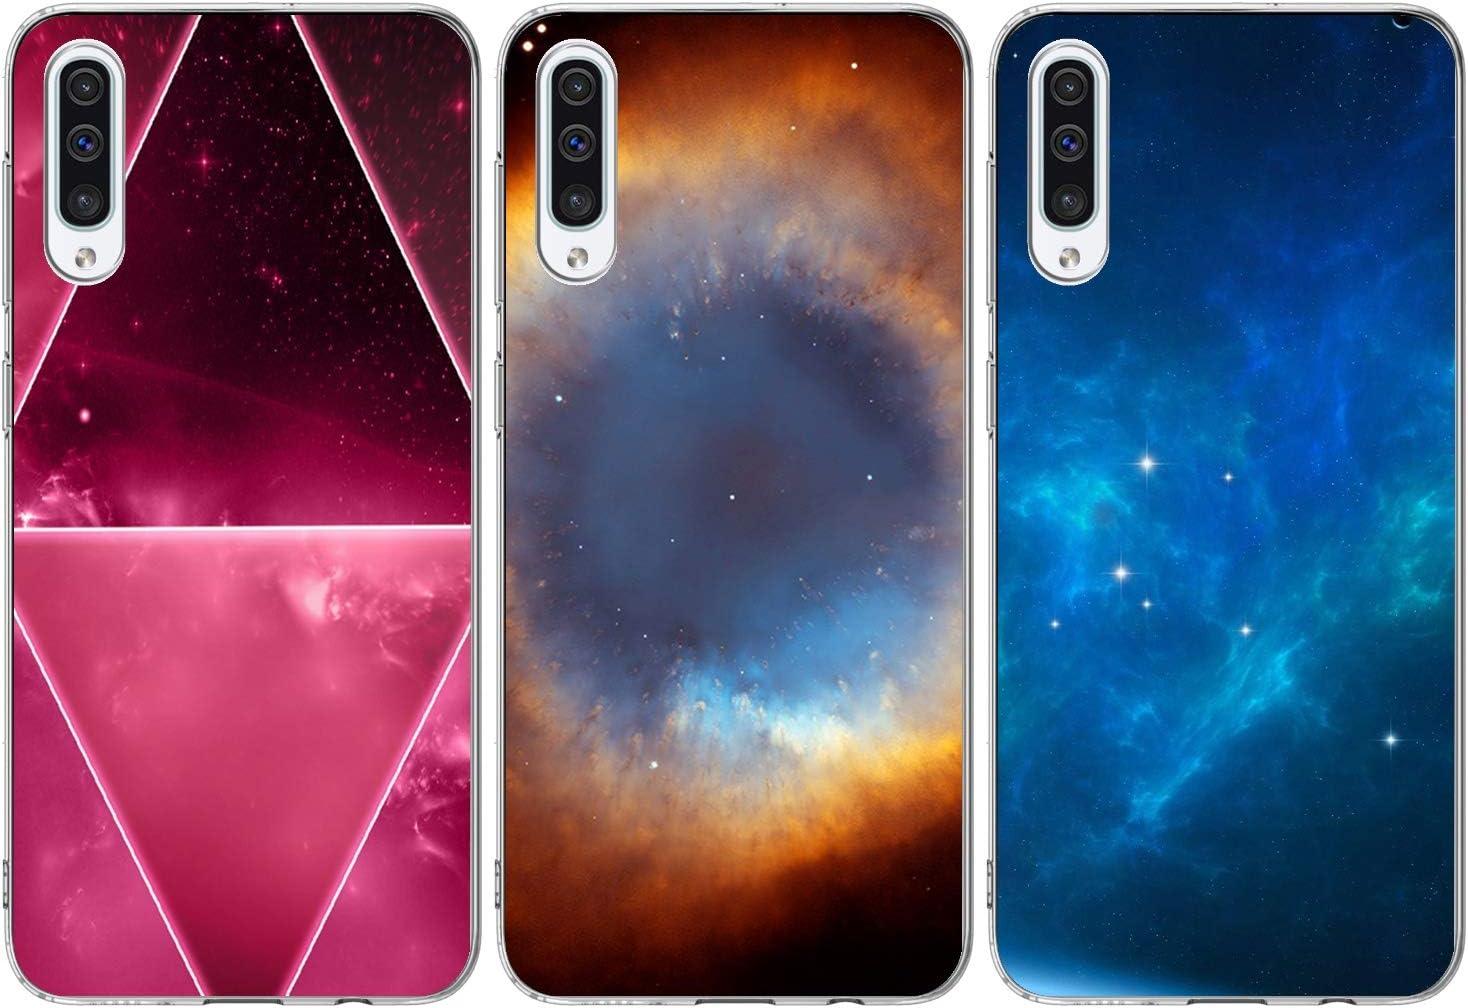 Sternenhimmelx2+Ankerx1 3X H/ülle Silikon Kompatibel f/ür Samsung Galaxy A50 Handyh/ülle Case Handytasche Schutzh/ülle Matt Durchscheinend TPU Bumper Cover 3 St/ück